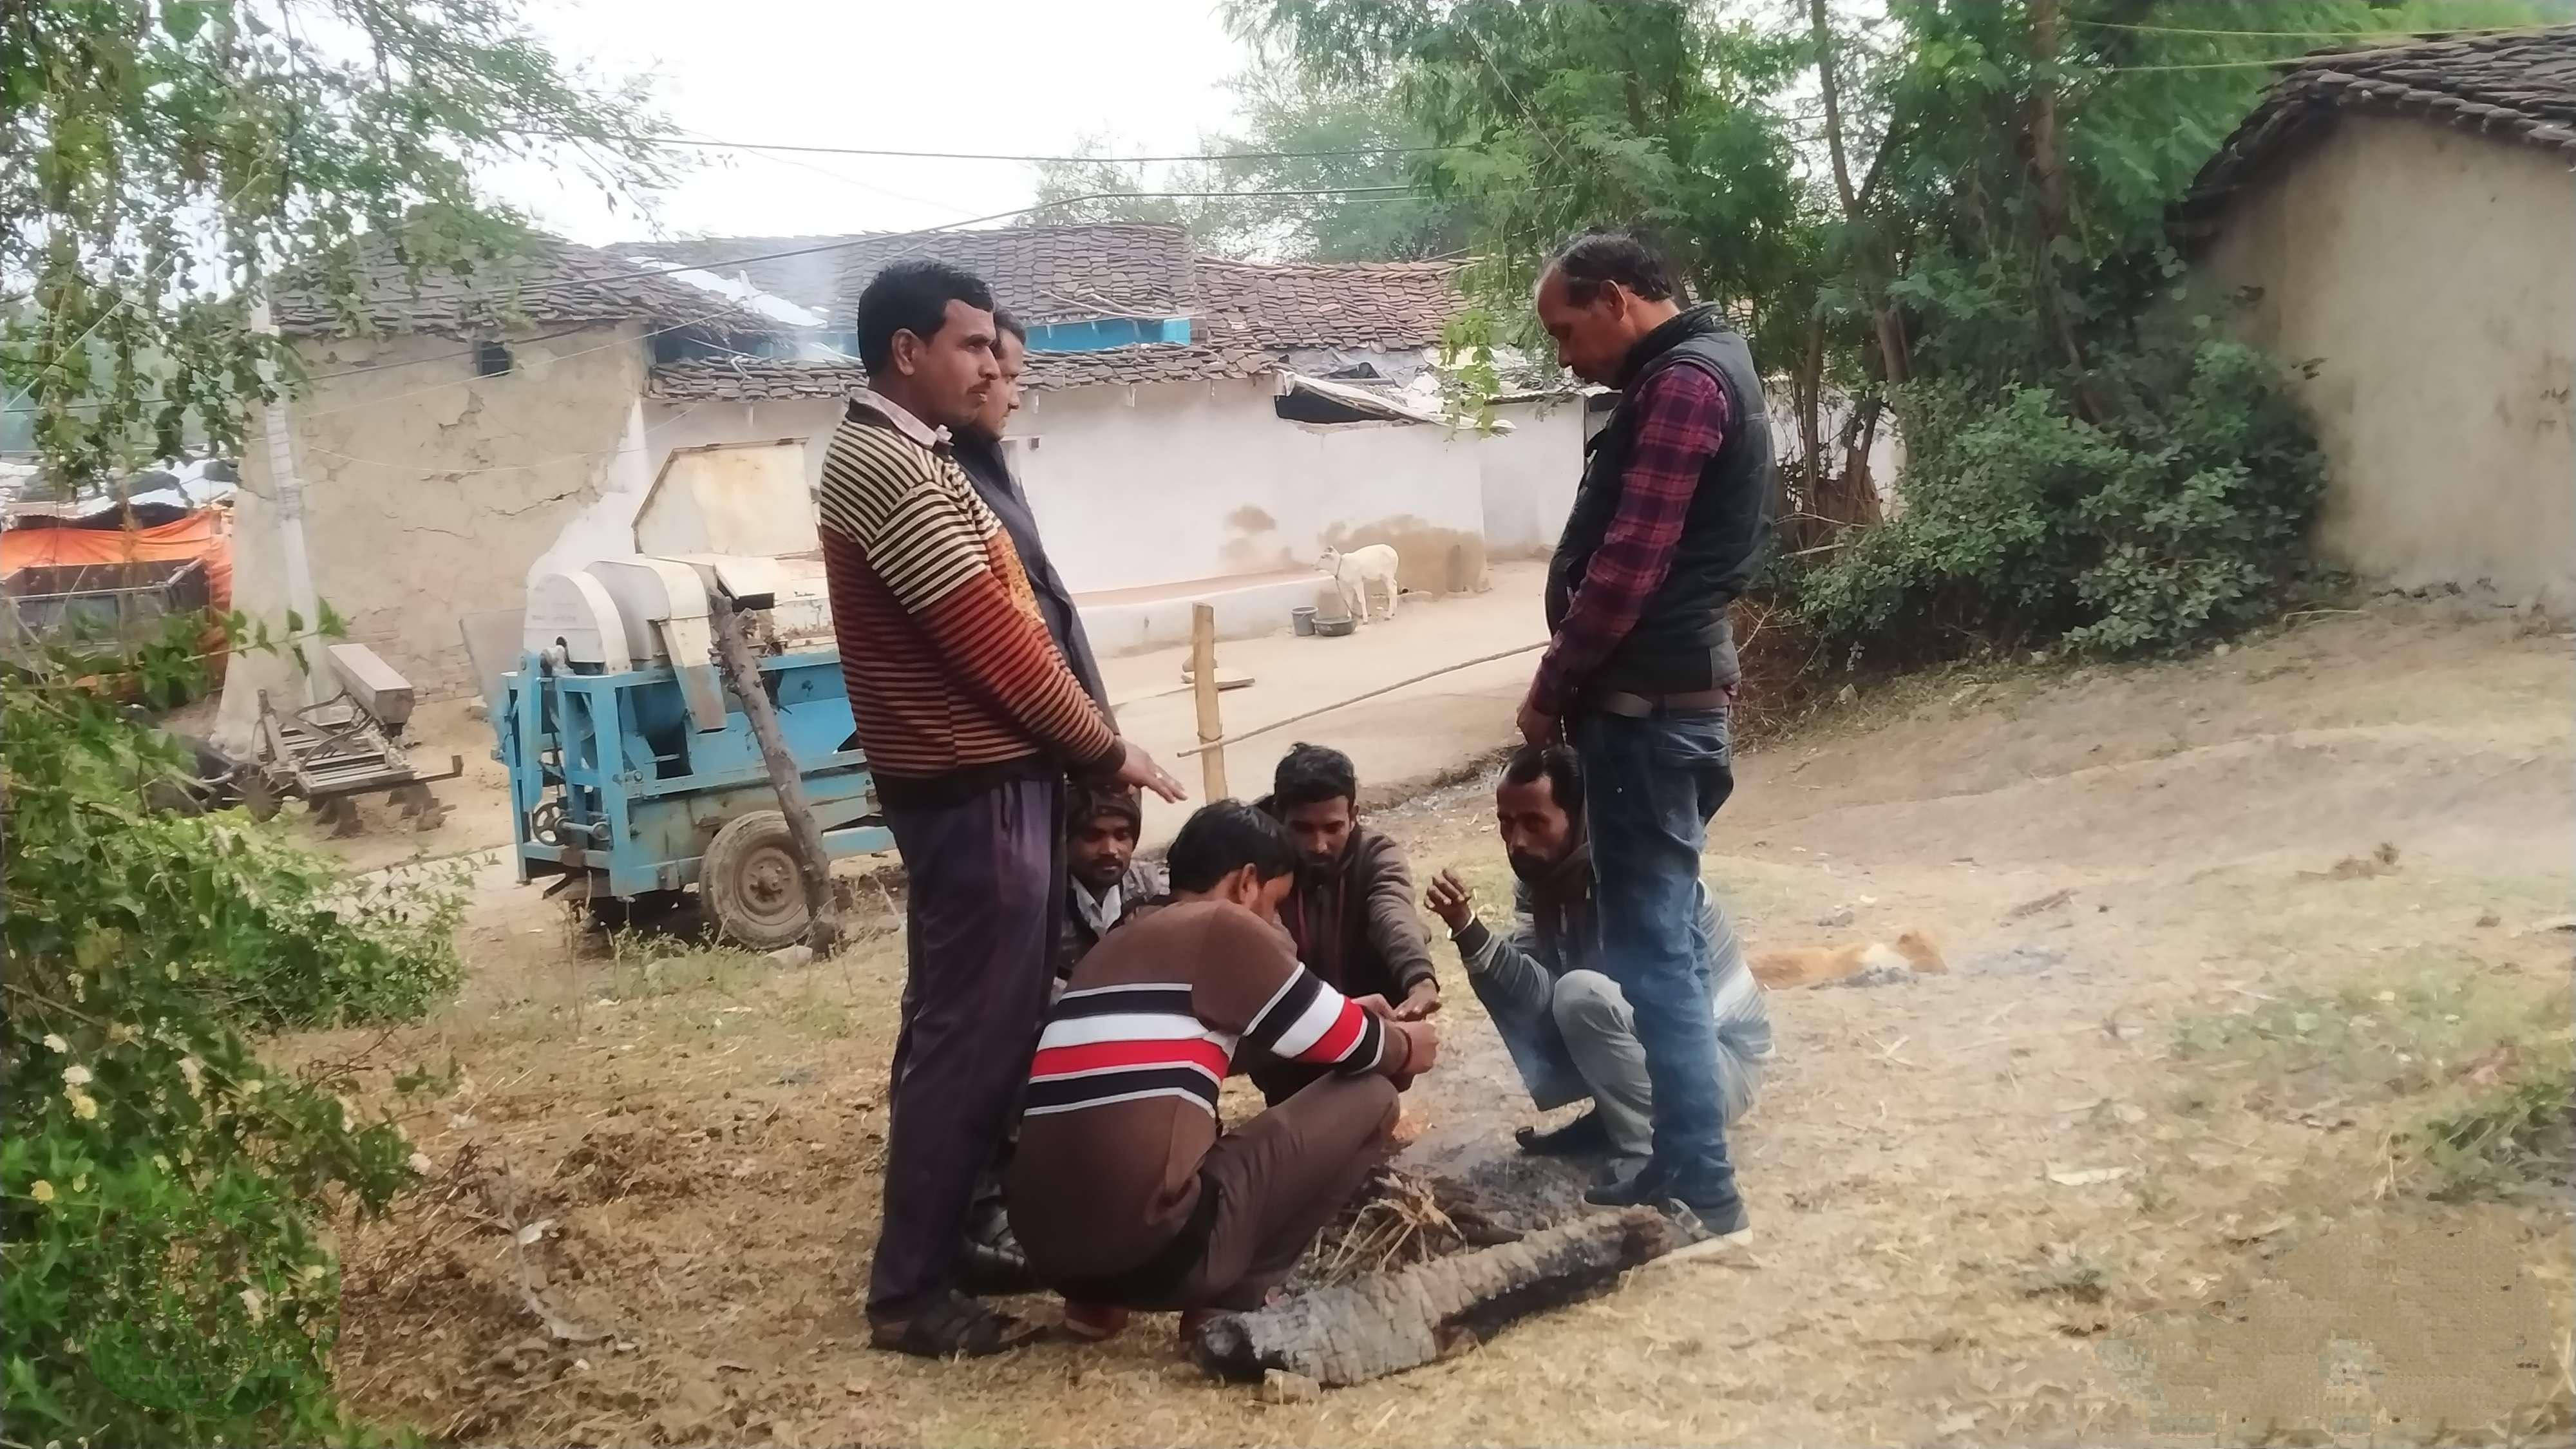 बामौरीशाला। ठंड से बचने अलाव के पास बैठे नजर आए ग्रामीण।